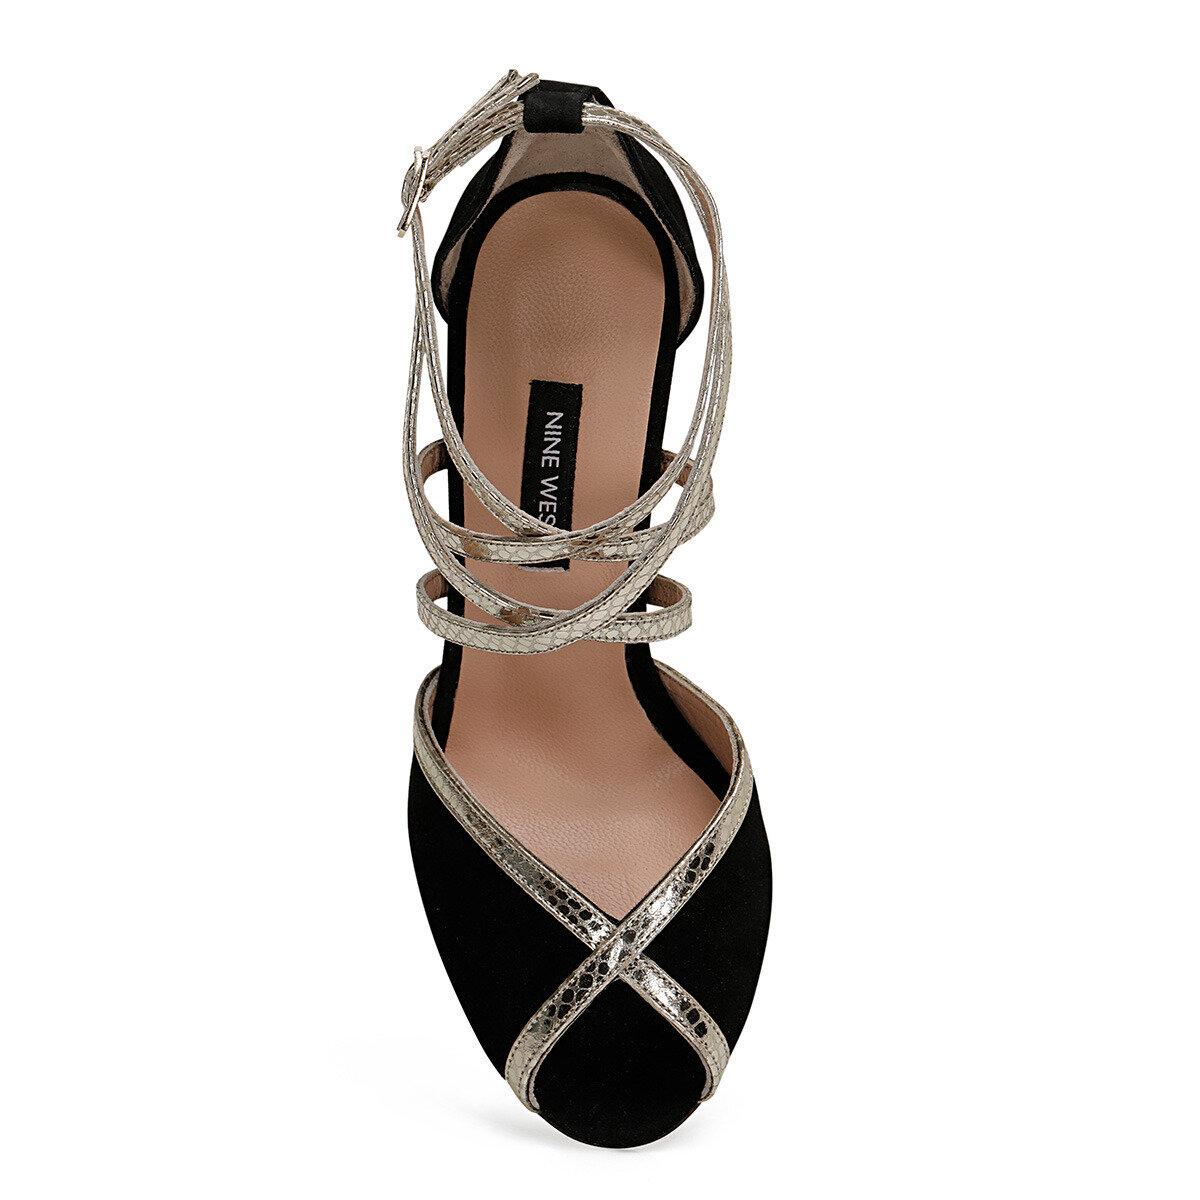 TROBA Siyah Kadın Topuklu Sandalet